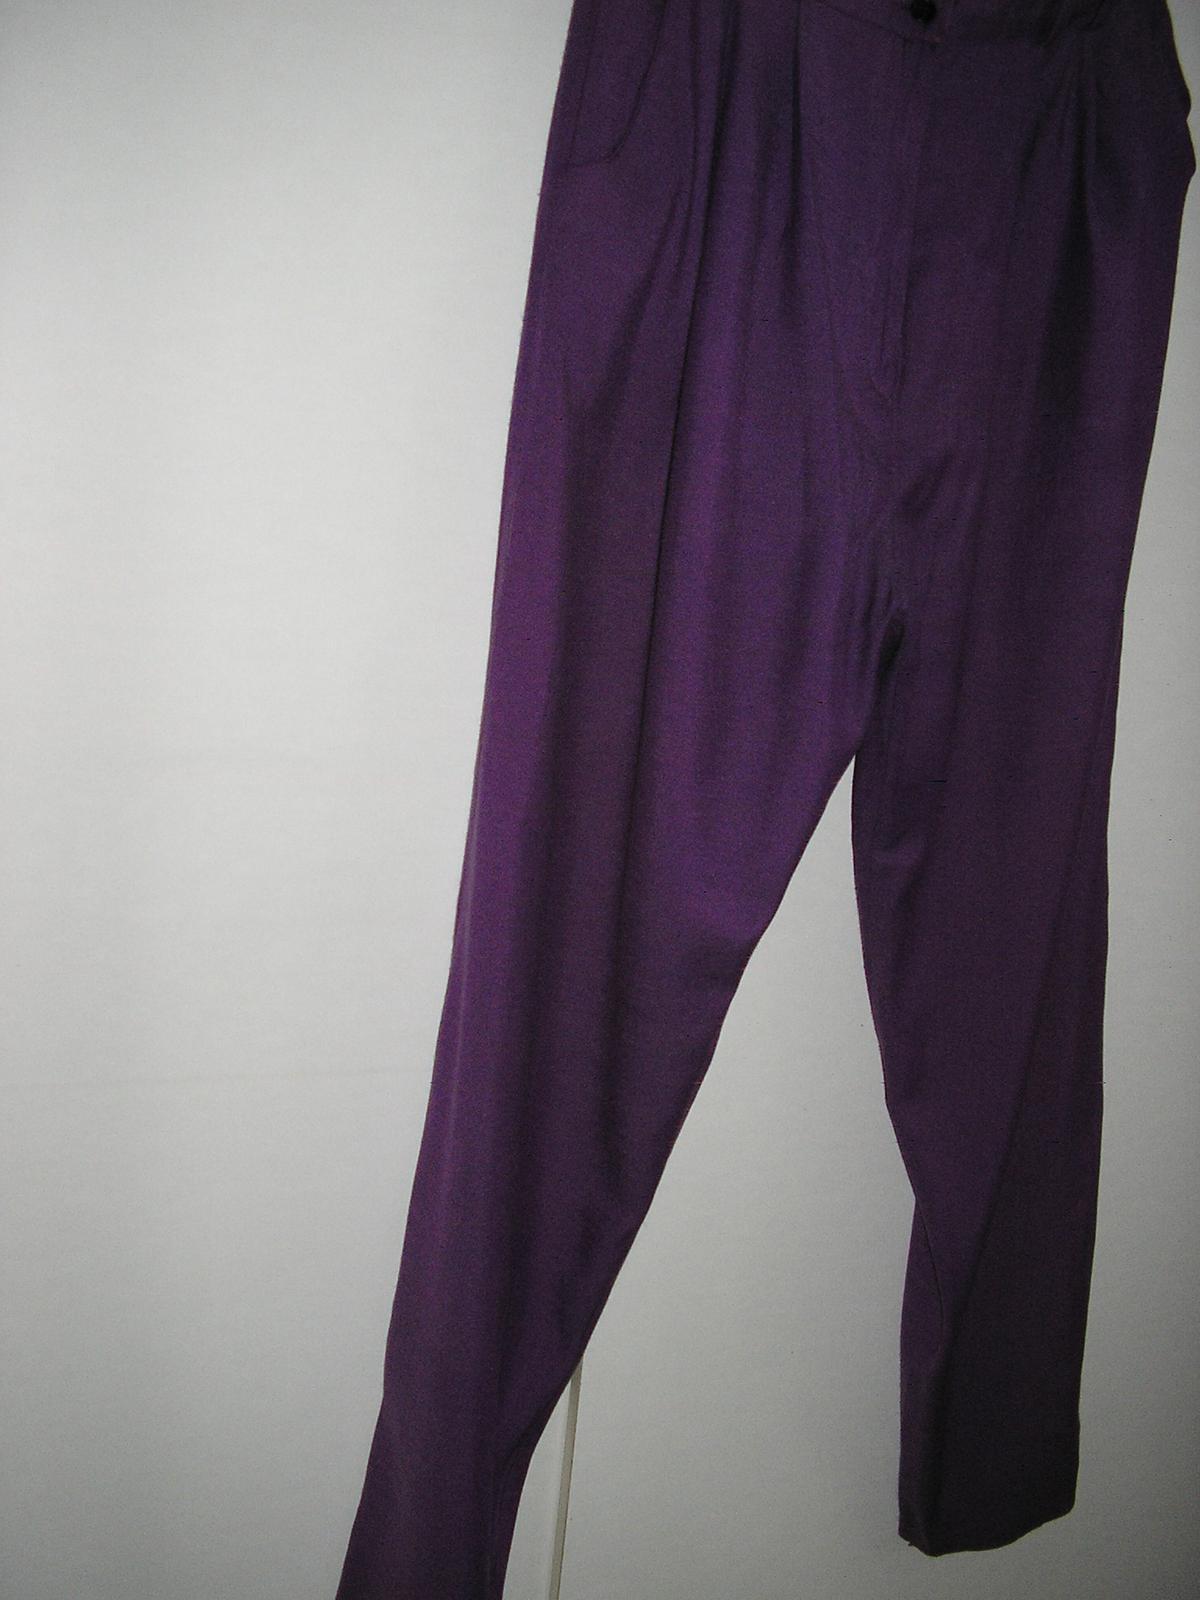 1182. Pinar nohavice - Obrázok č. 1